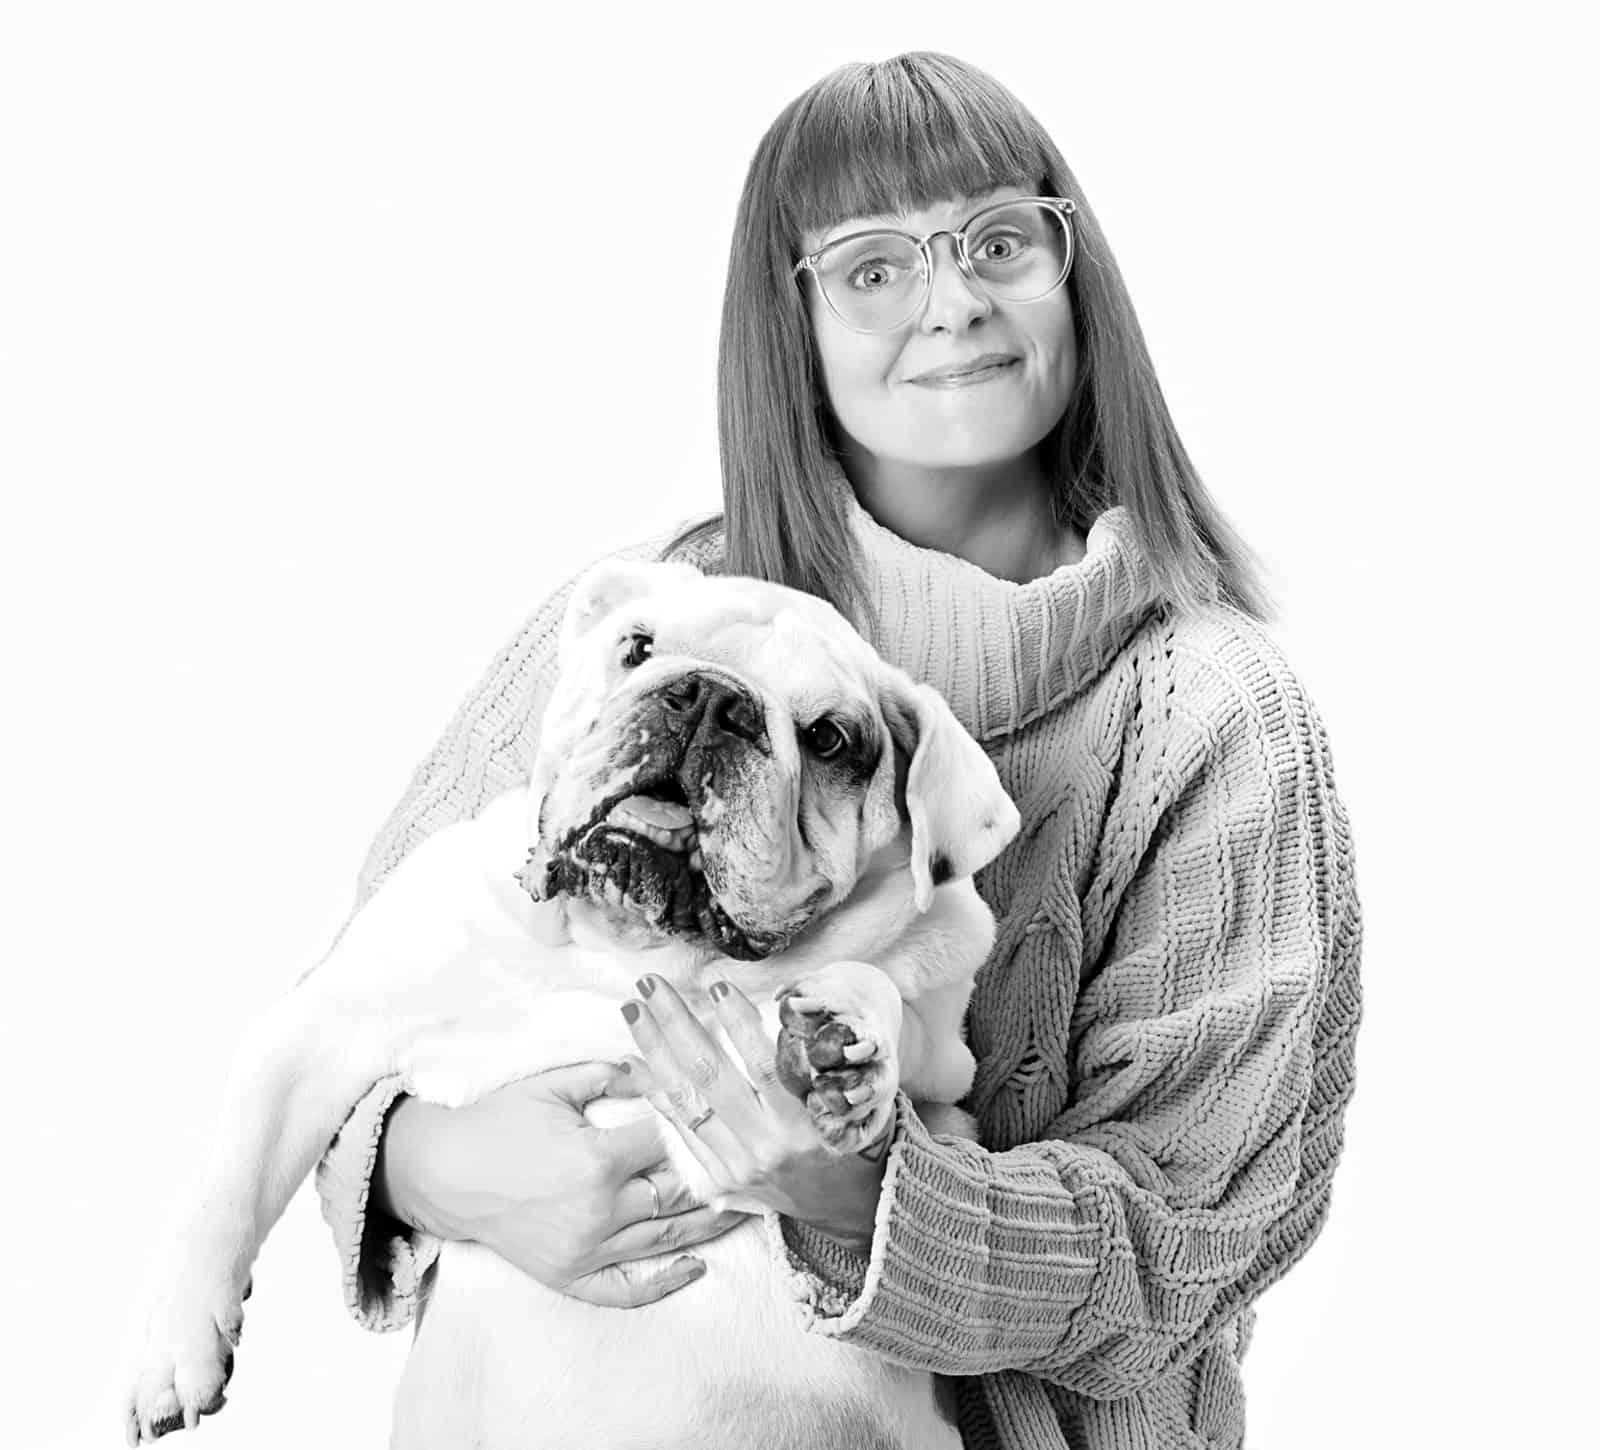 Portrait of Kimberly Lostrocio, Videographer at Siege Media